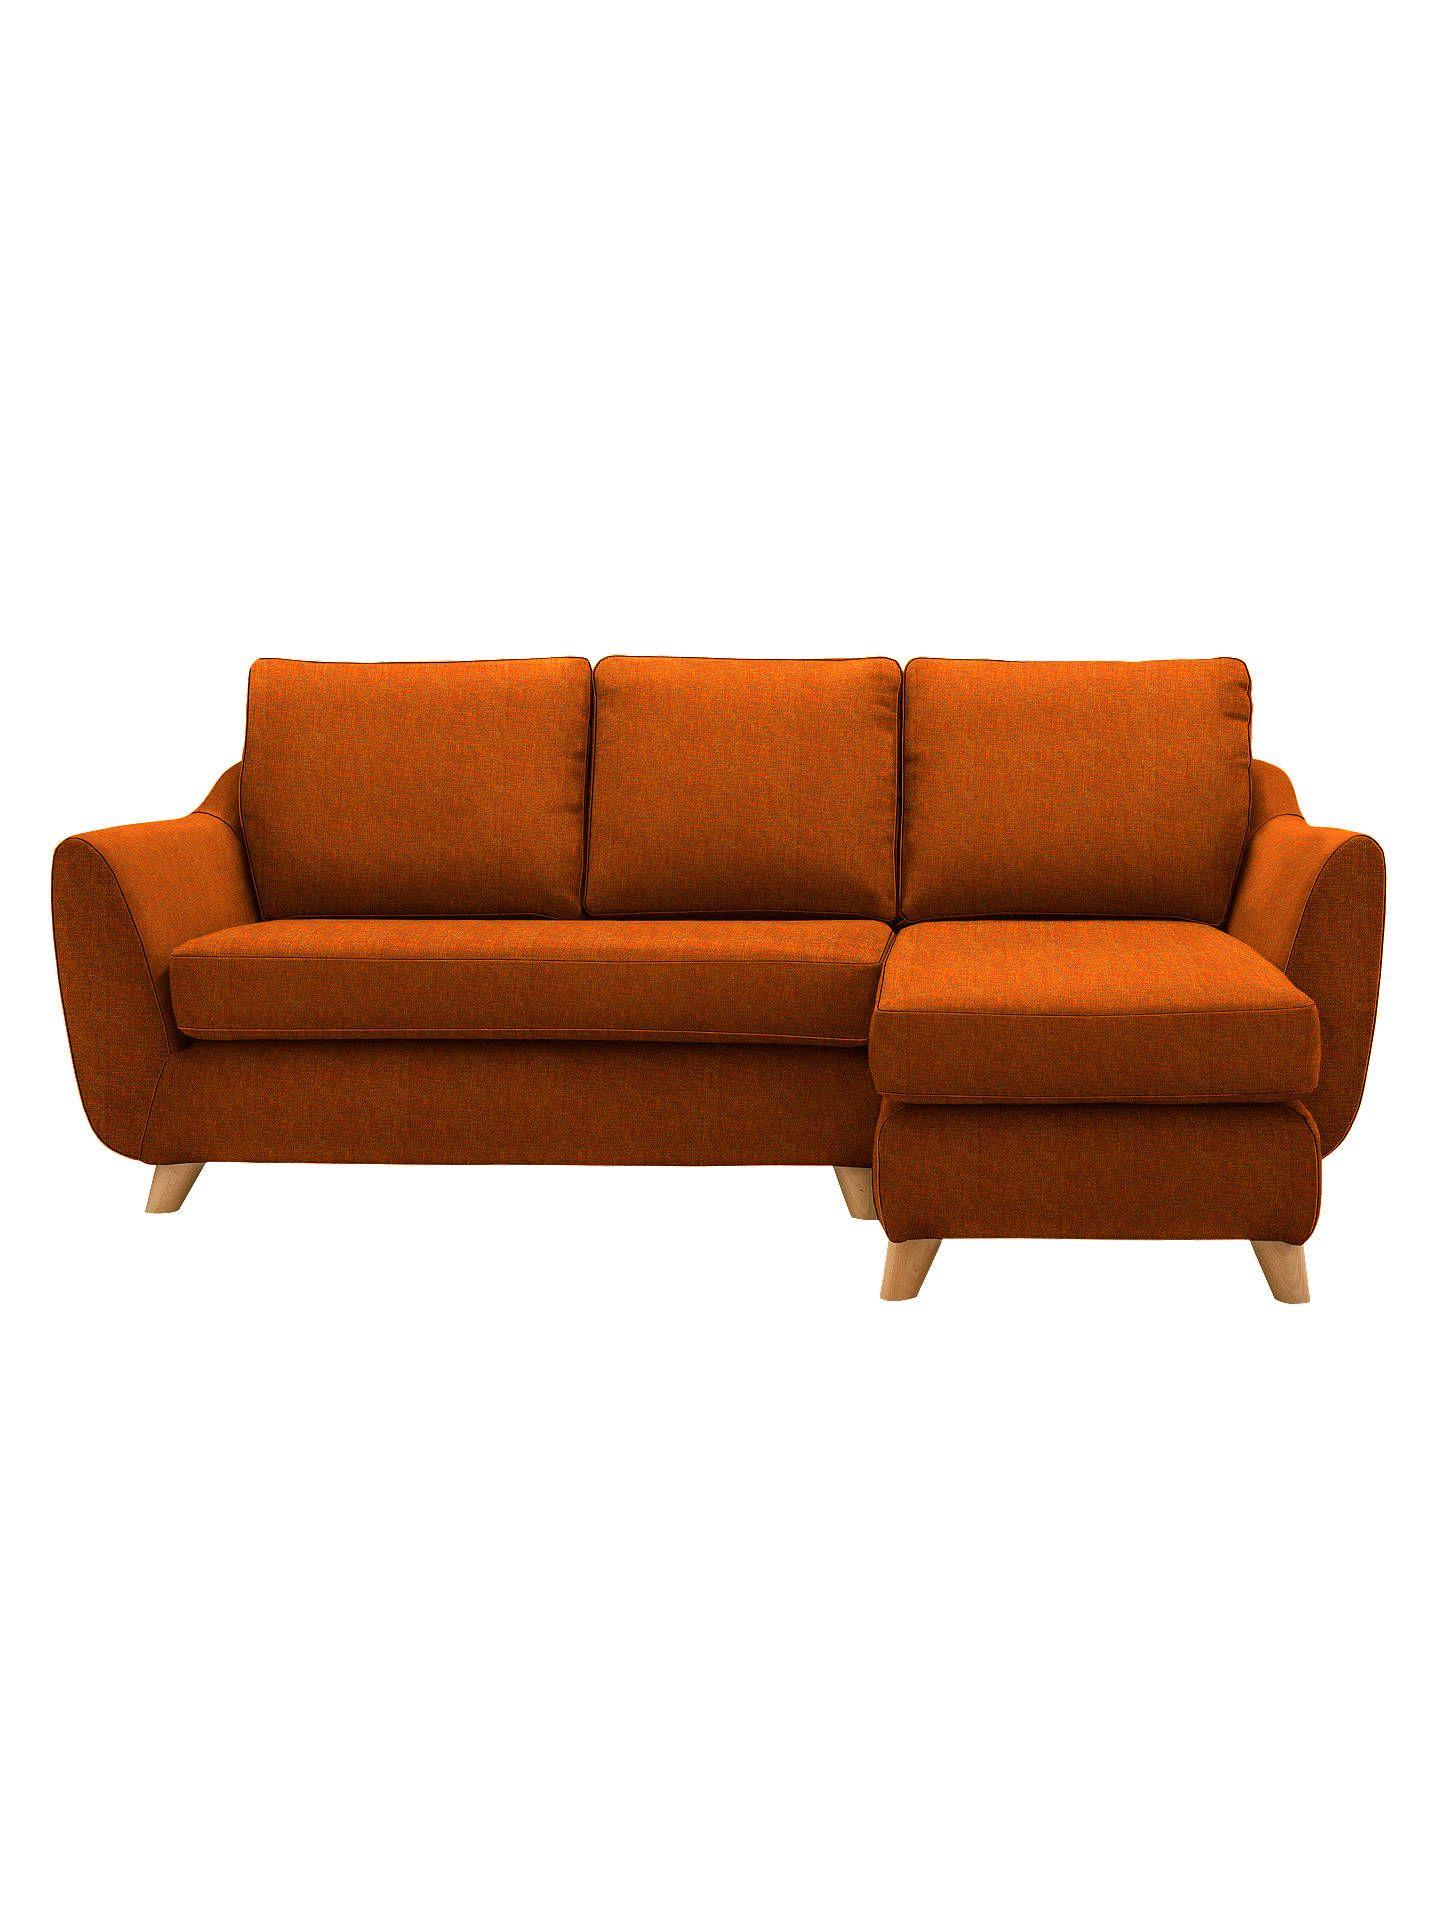 BuyG Plan Vintage The Sixty Seven RHF Chaise End Sofa, Marl ...